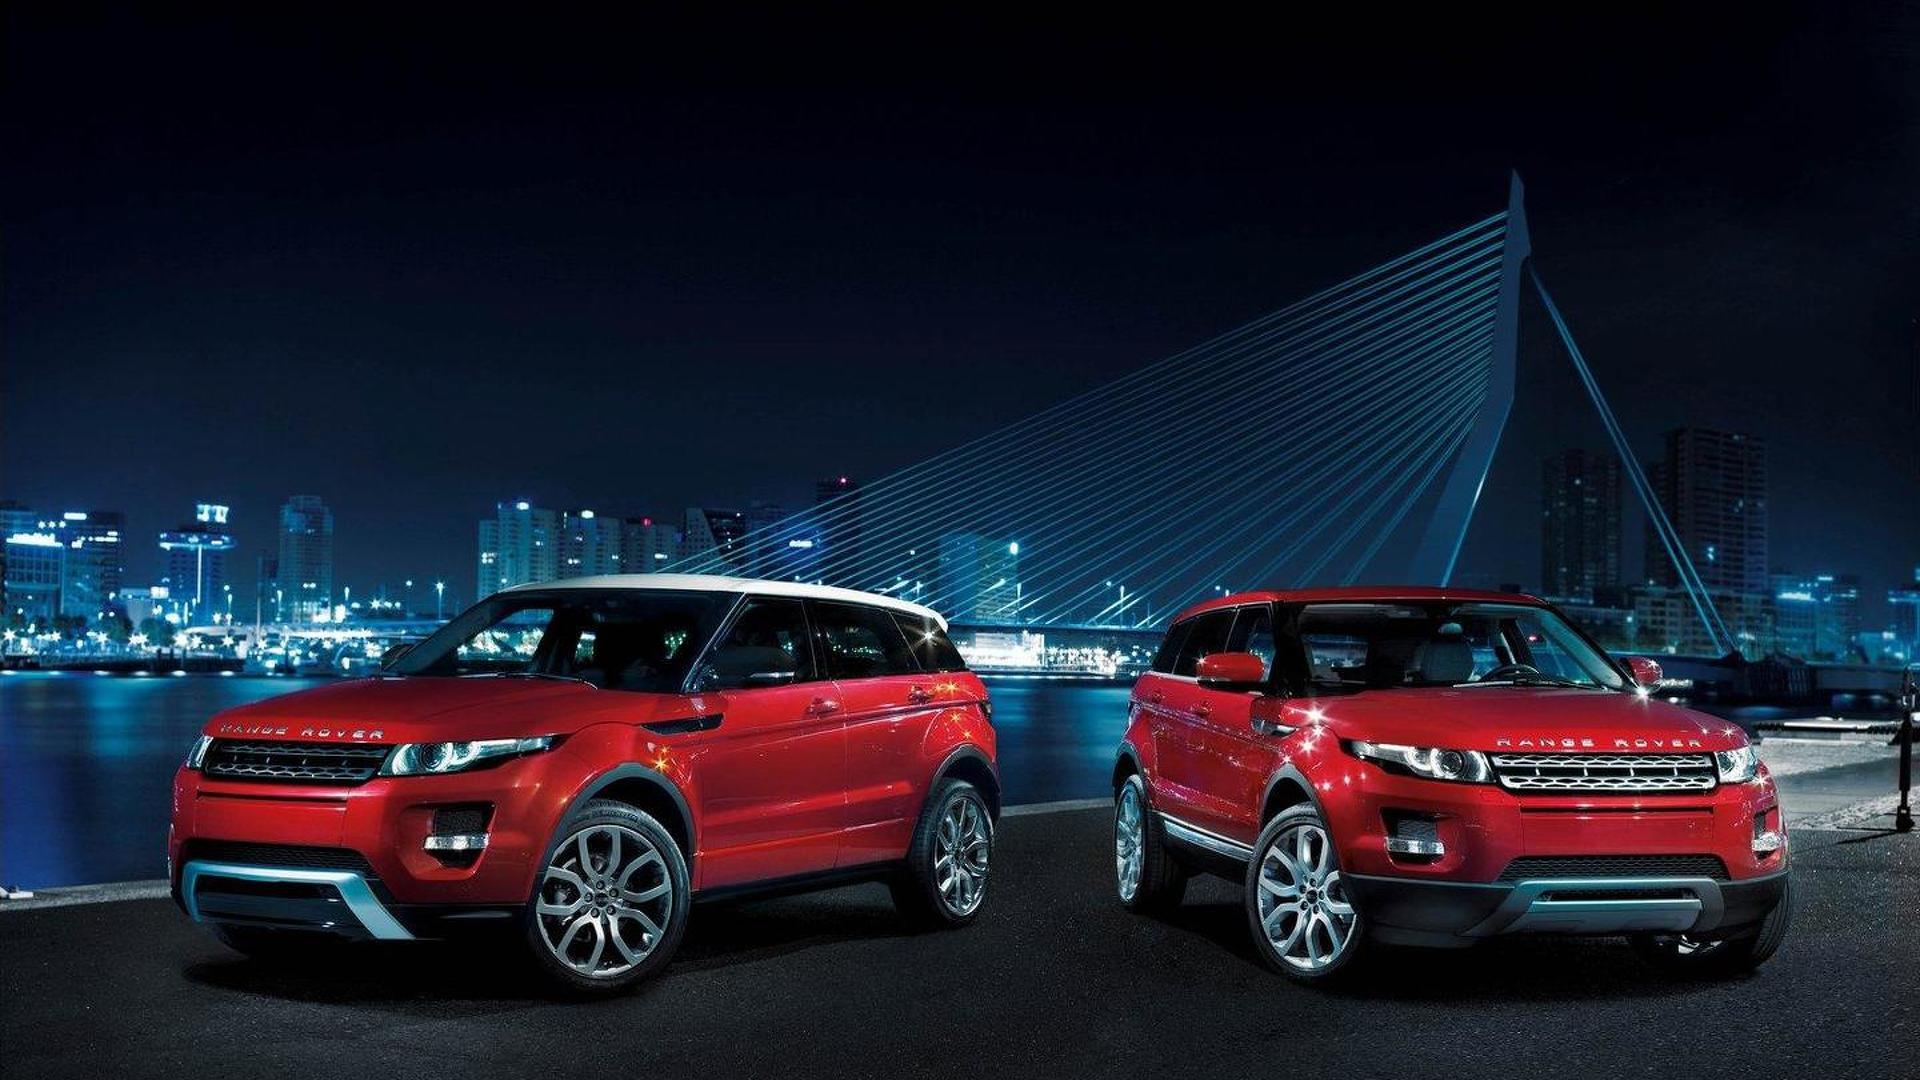 Land Rover introduces 5-door Range Rover Evoque